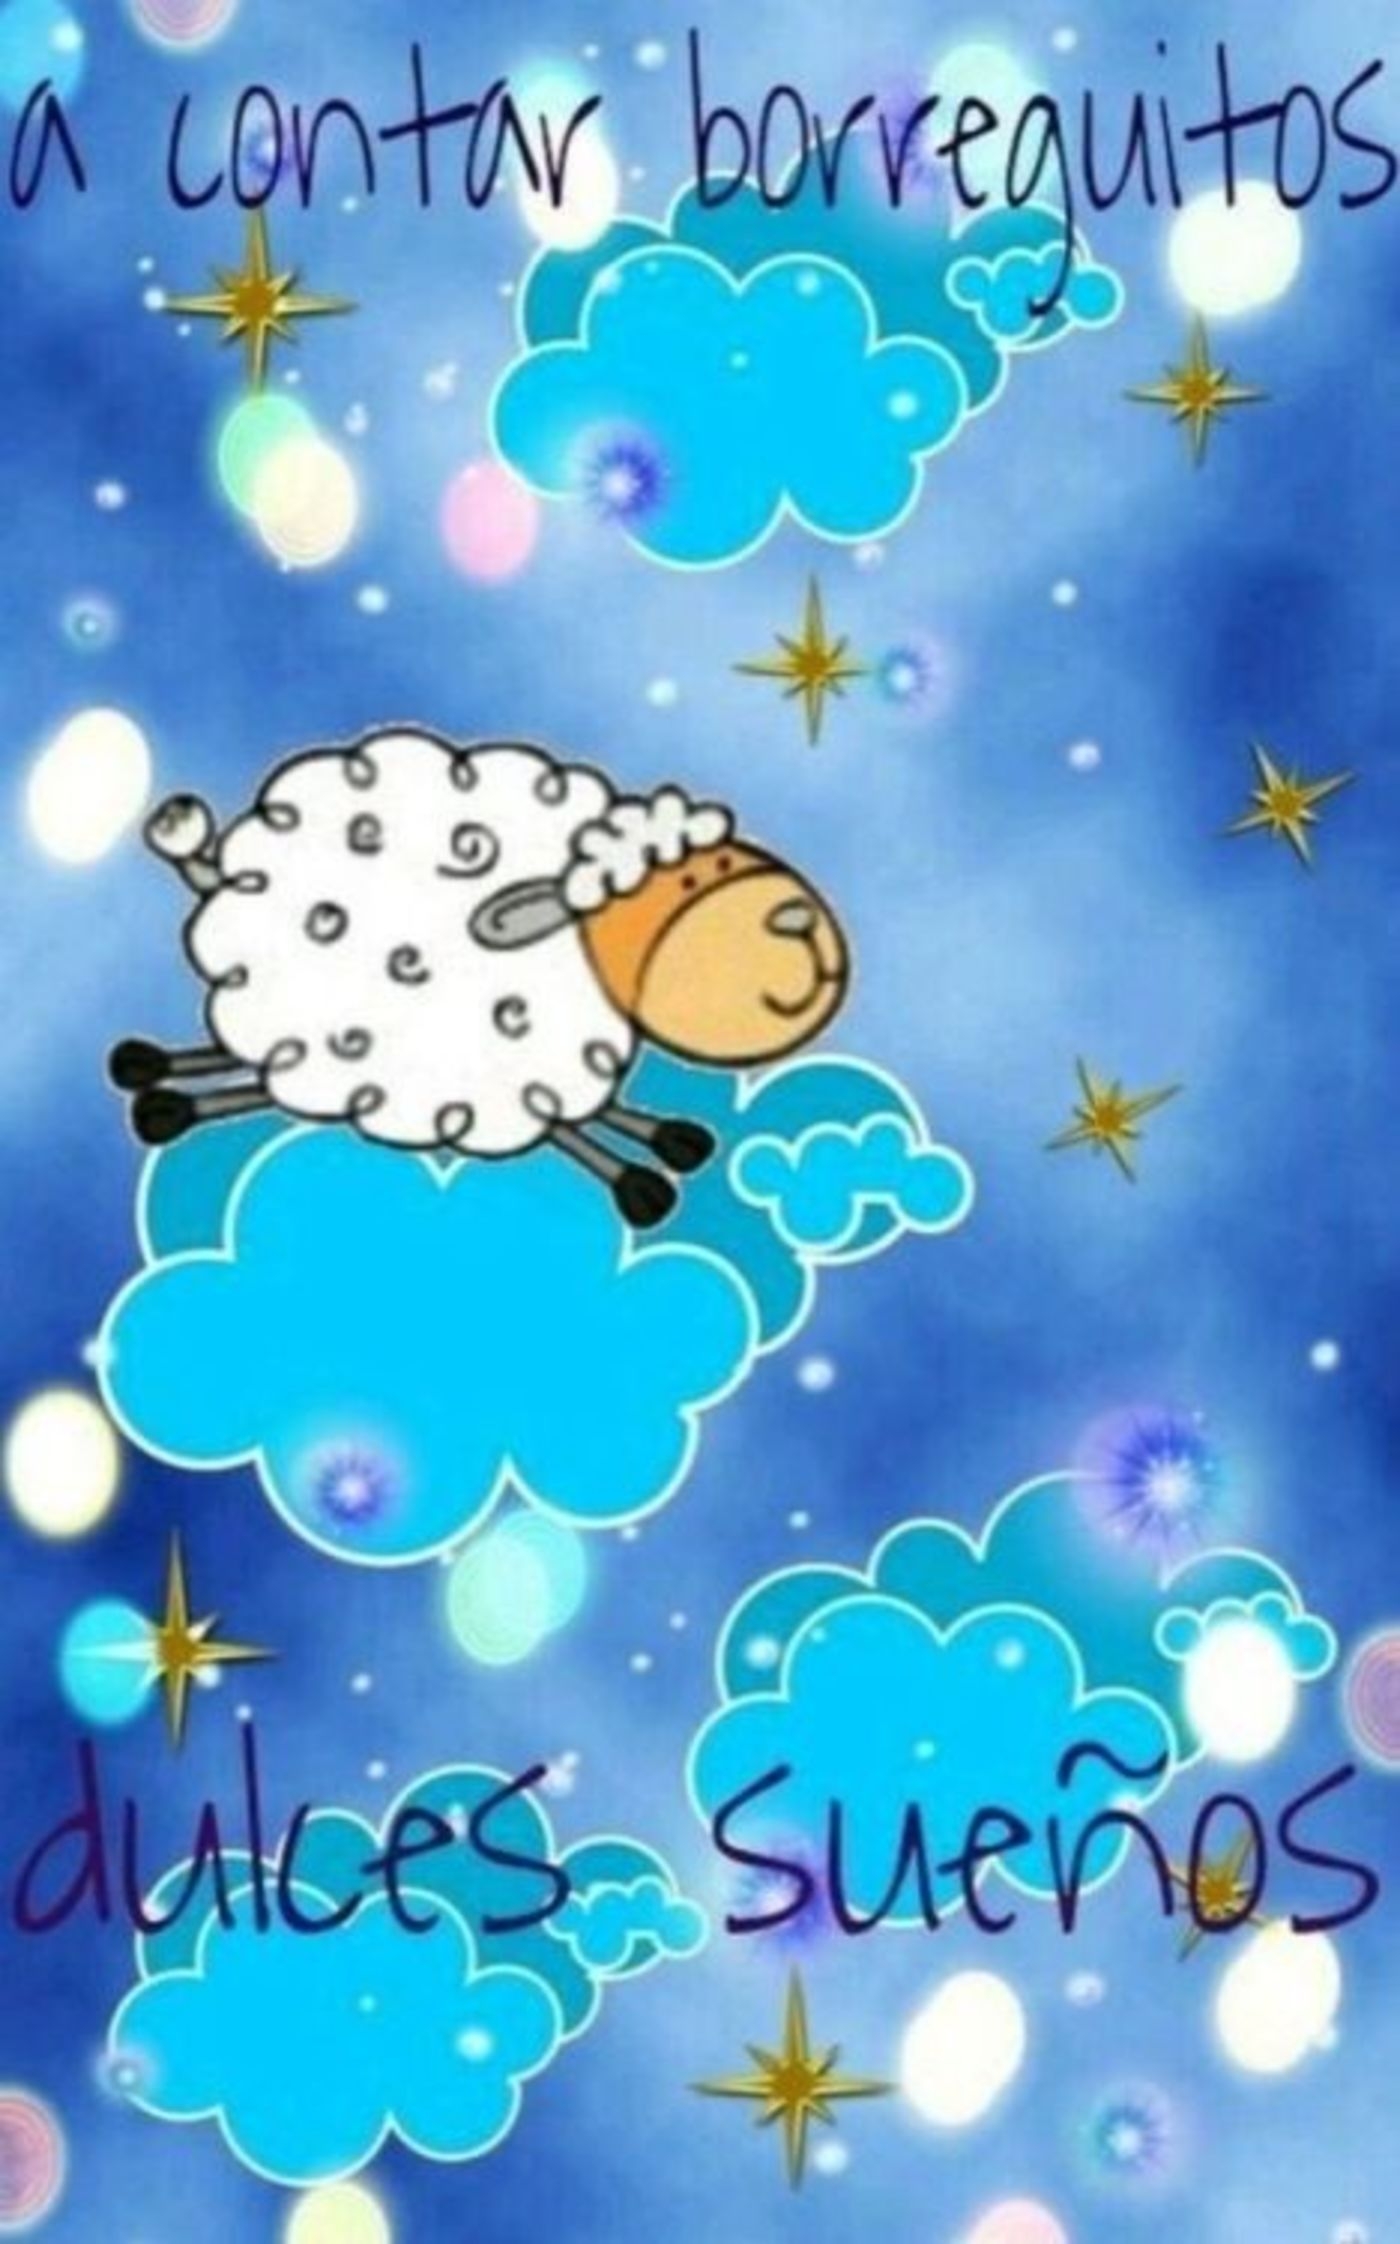 A contar borreguitos, dulce sueños